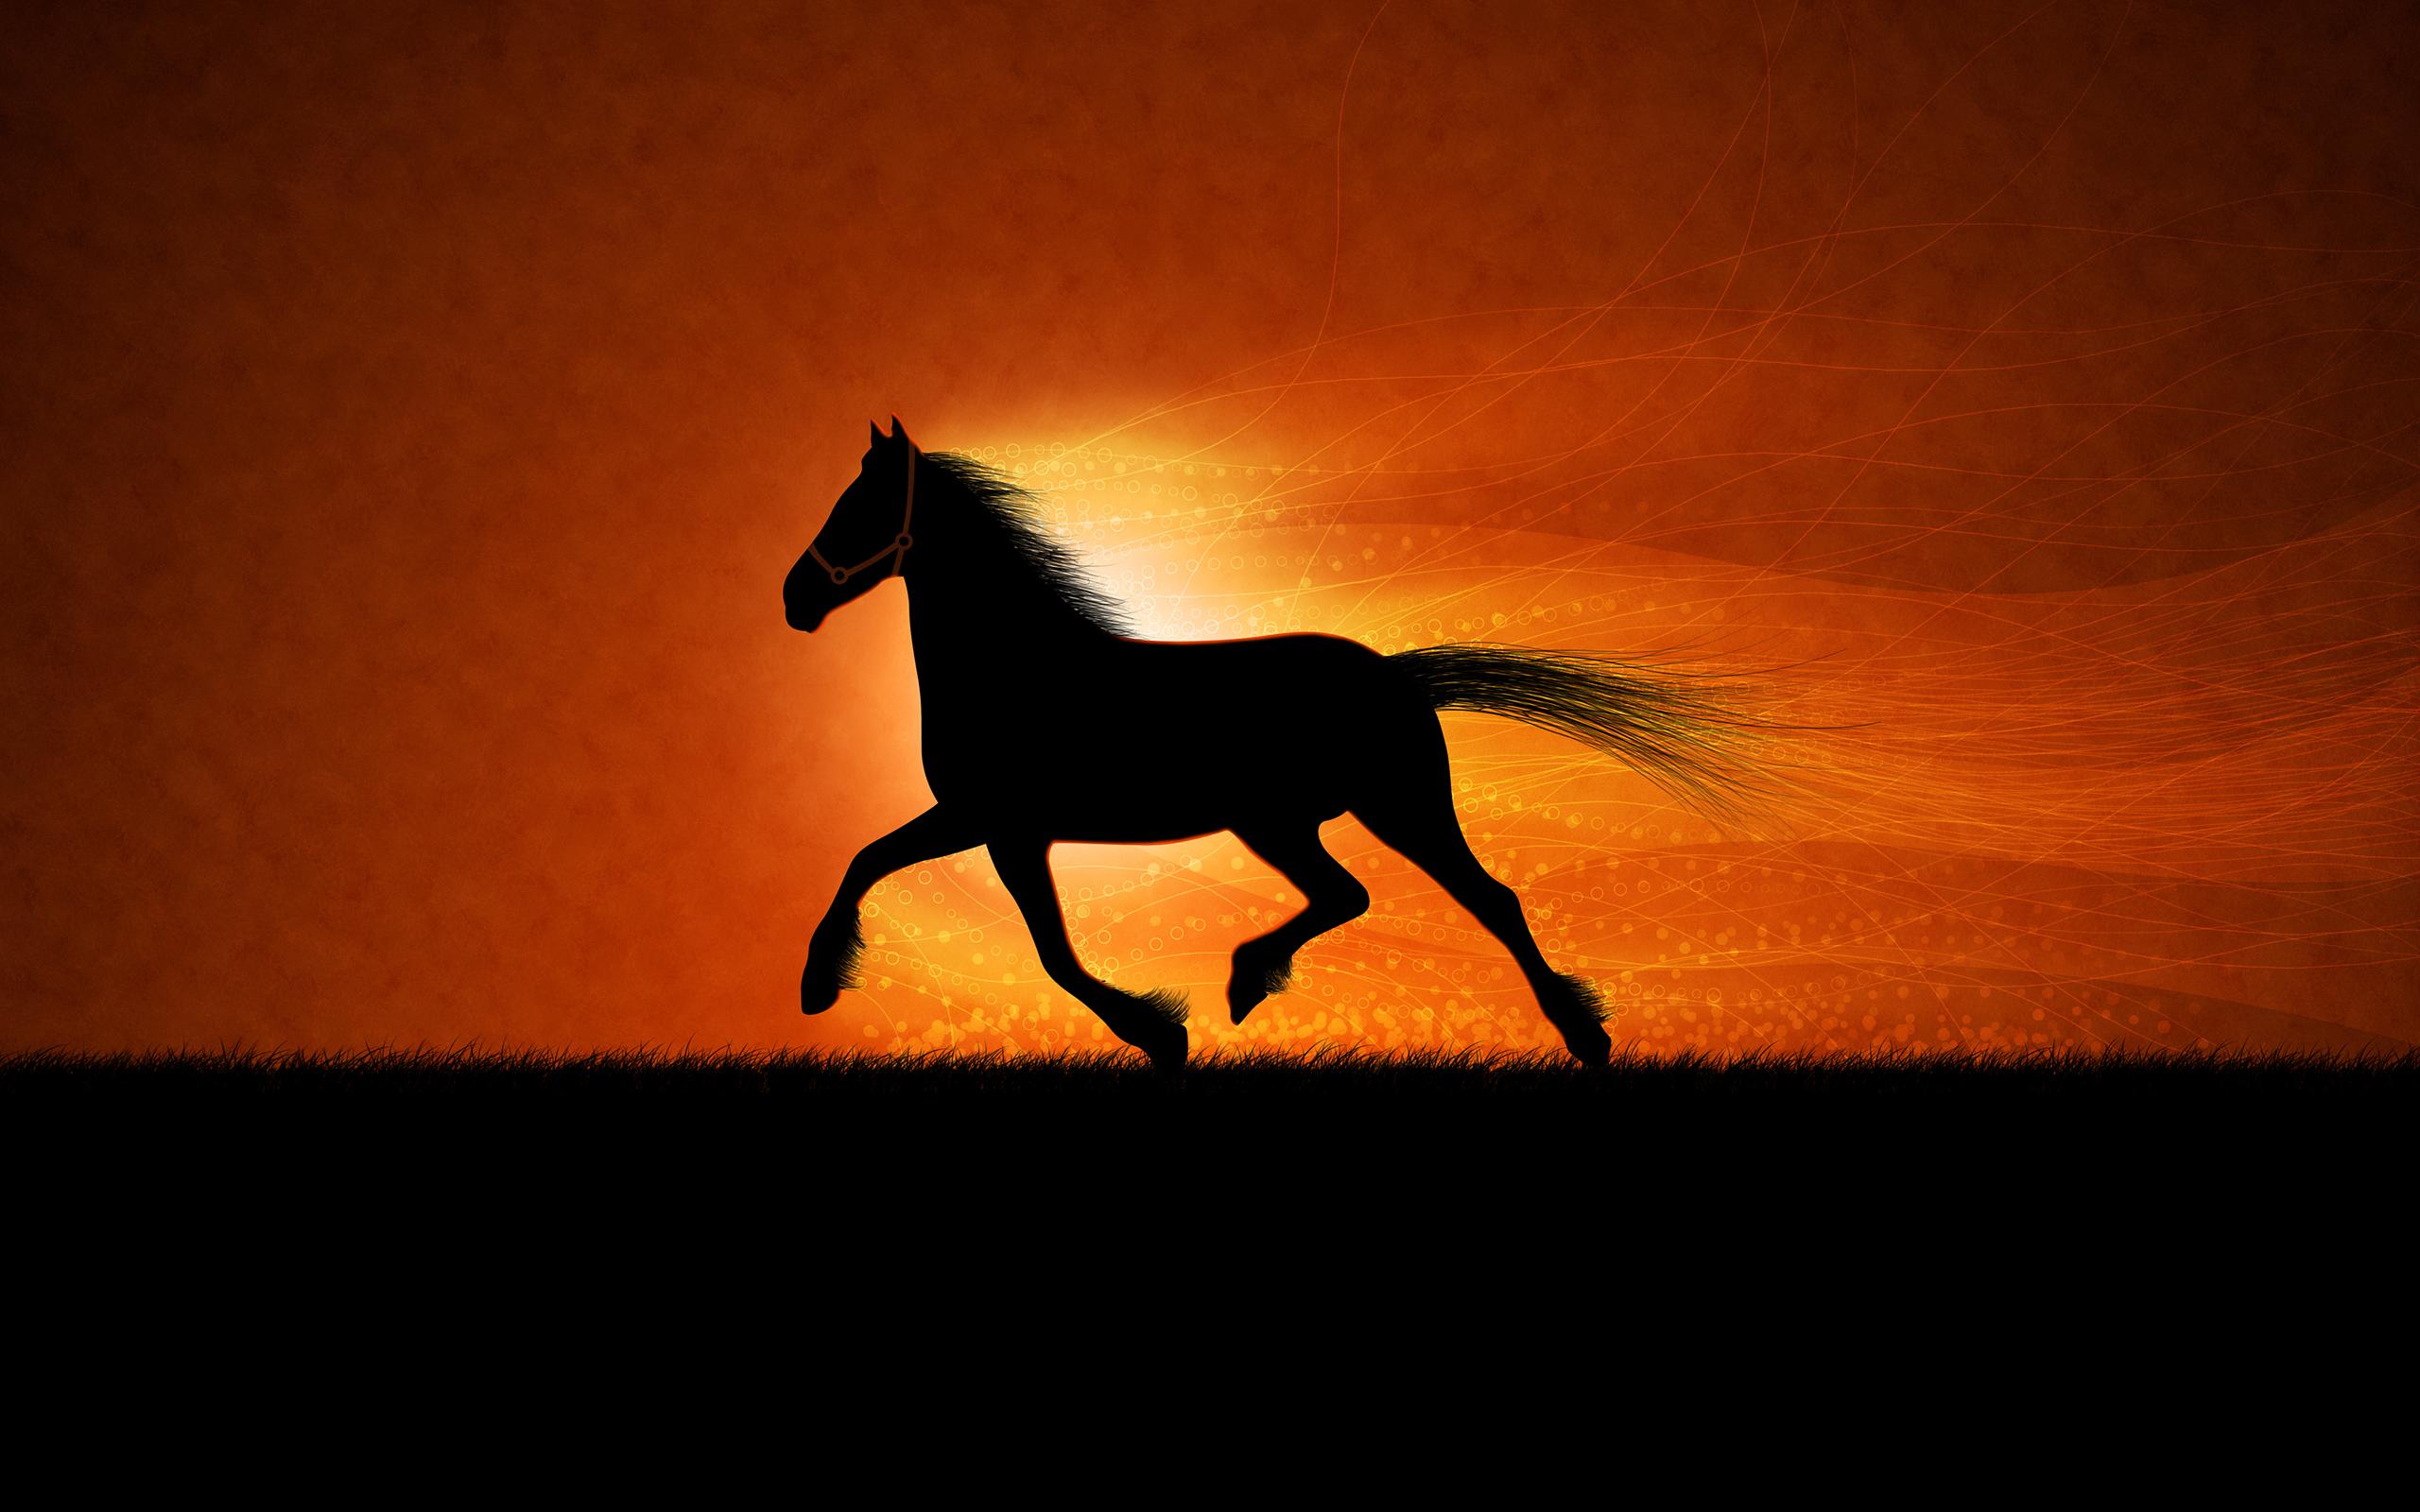 HD Wallpapers Running horse